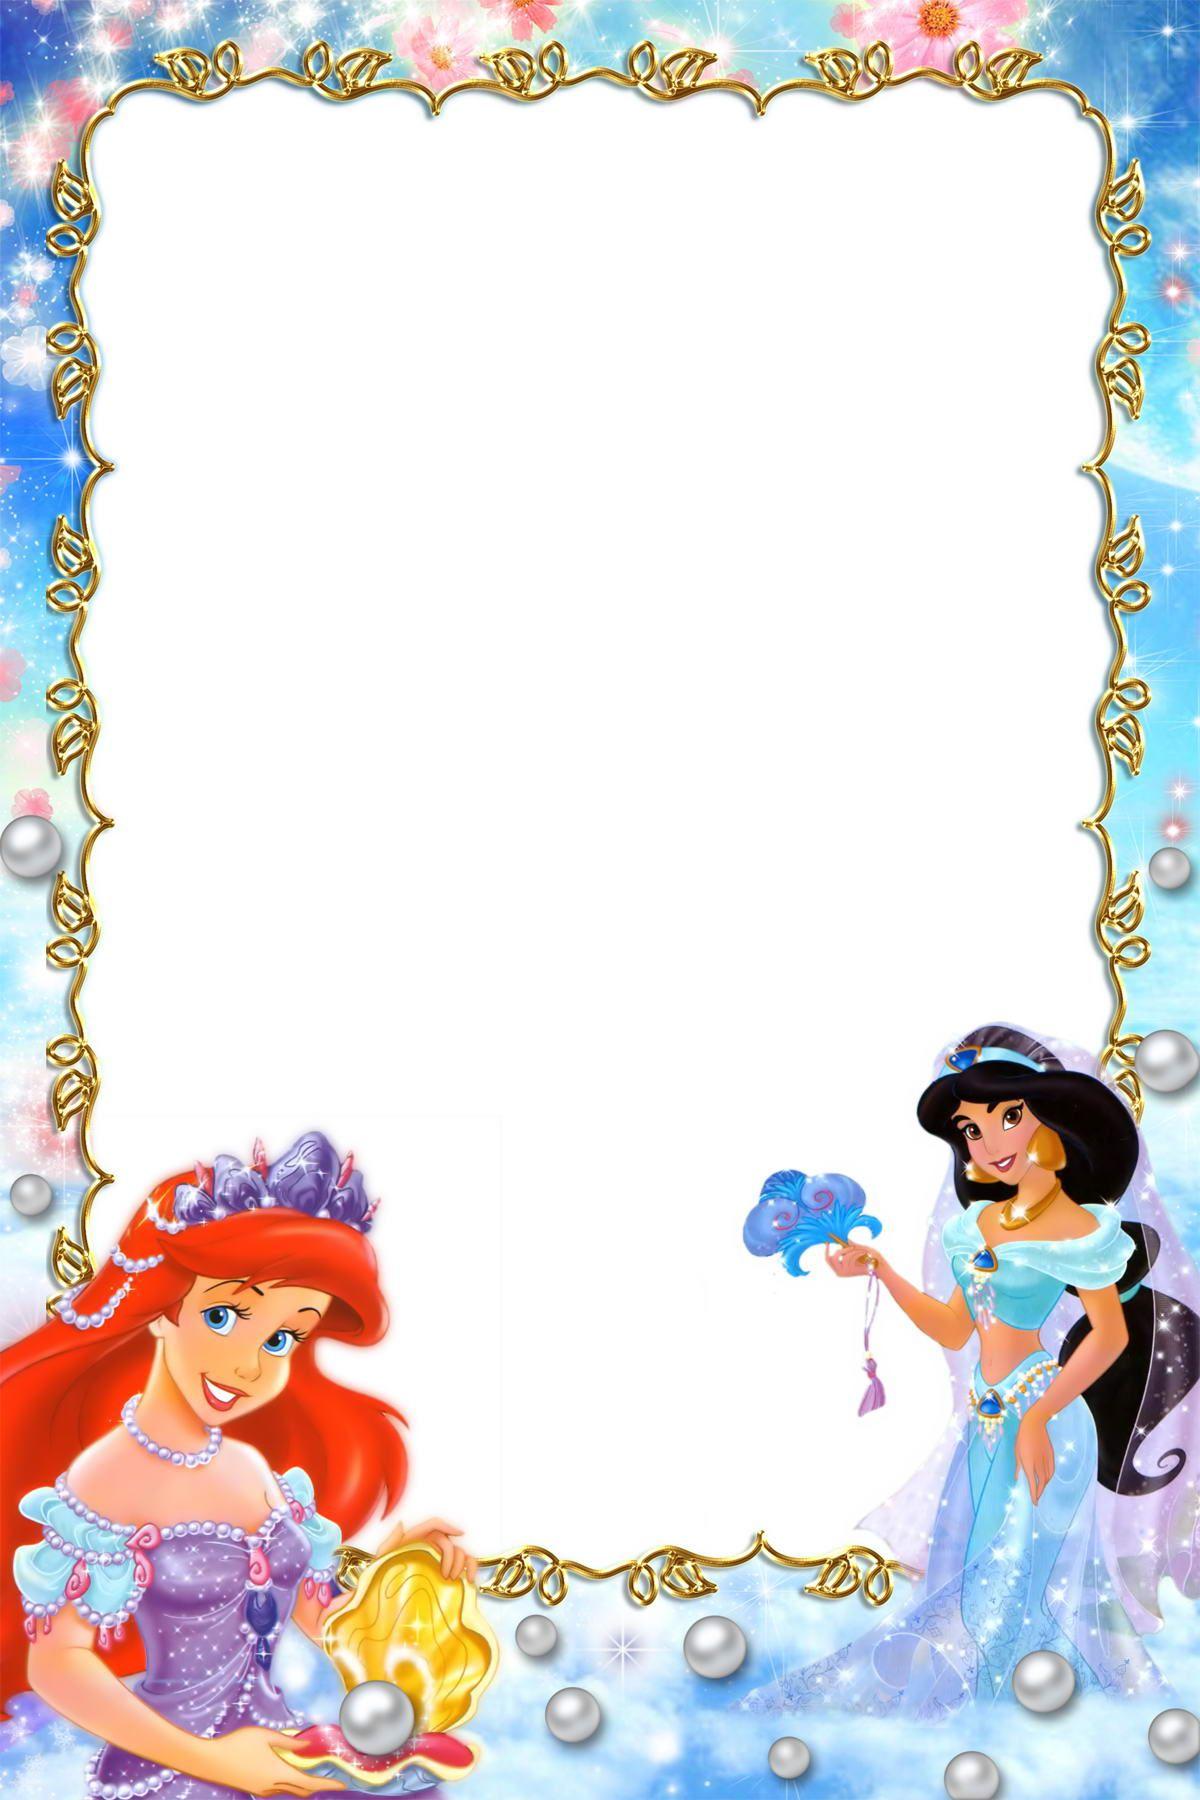 Princess border frames pictures.